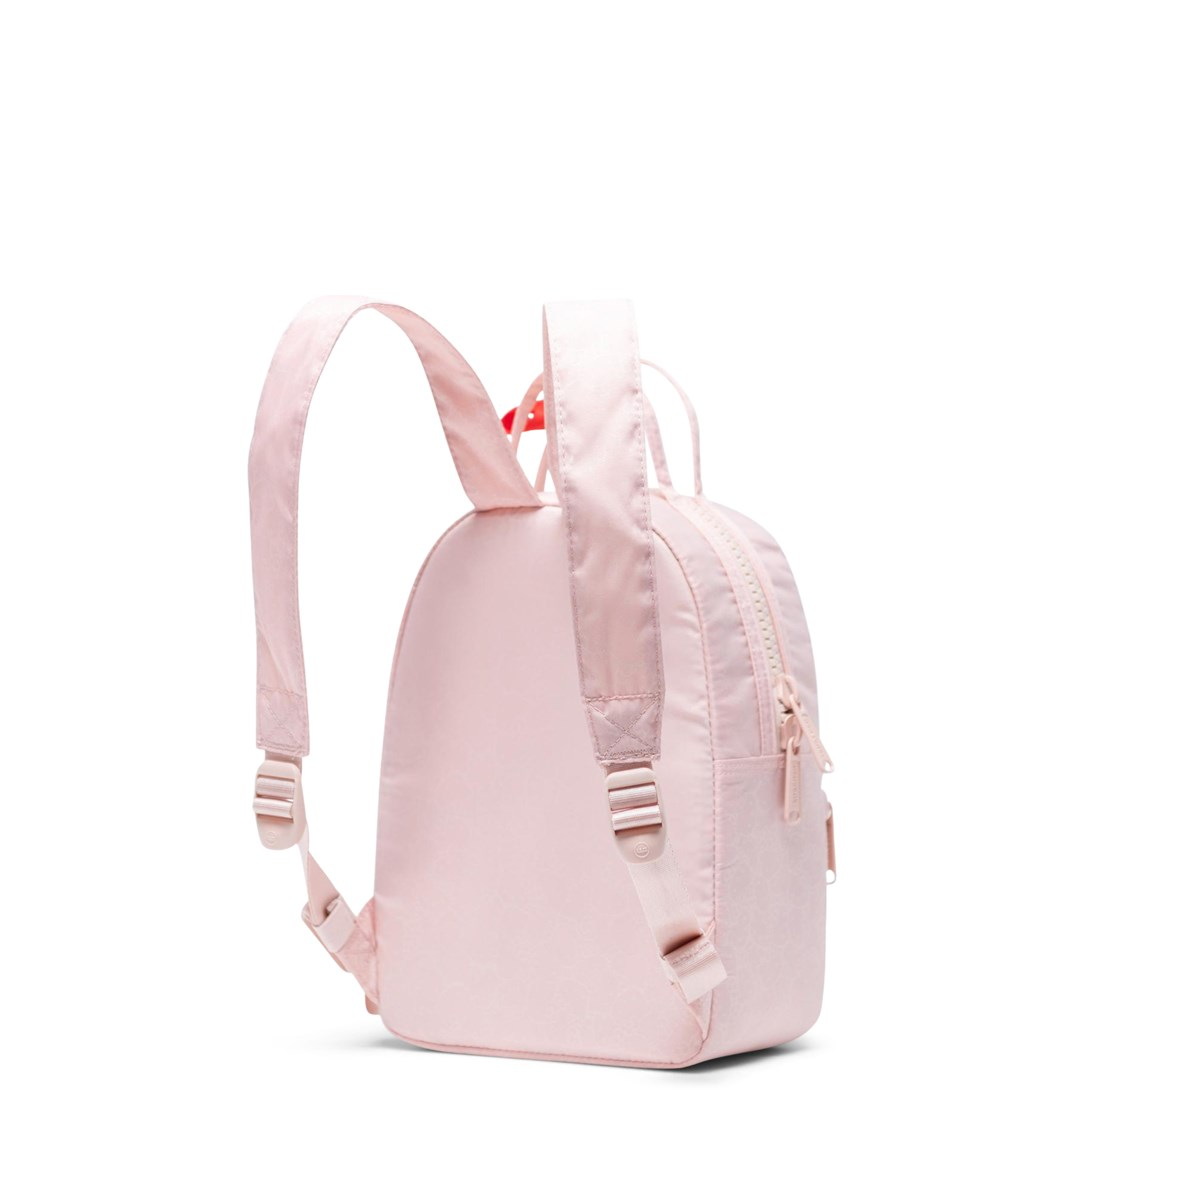 6f6c79422 Hello Kitty Nova Mini Backpack. Previous. default view; ALT1; ALT2; ALT3